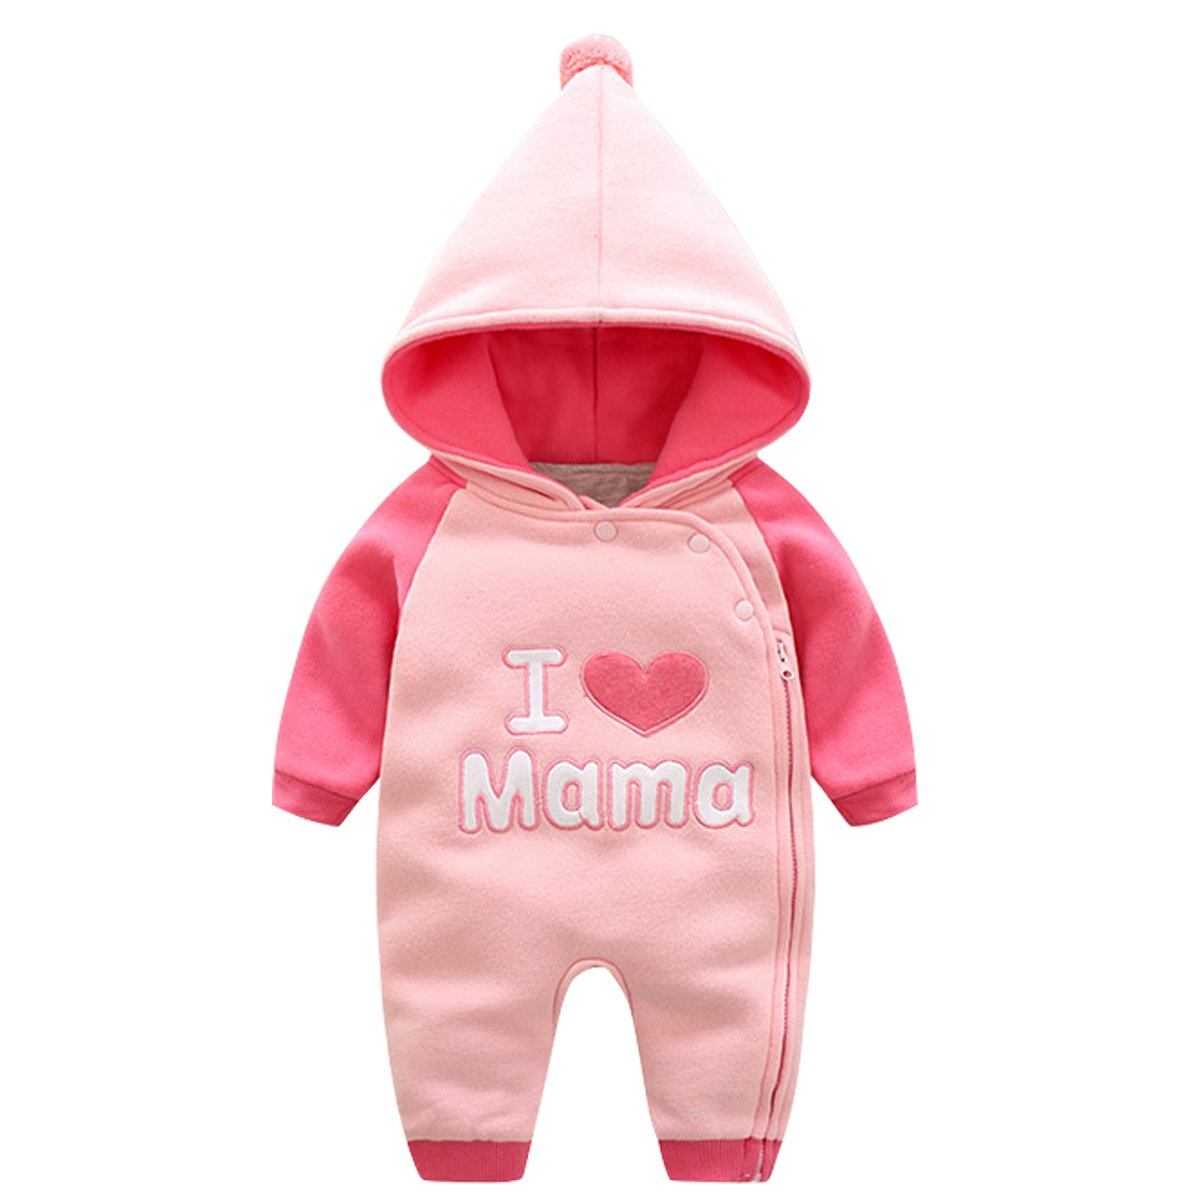 Bebone Infant Baby Girls Cotton Long Sleeve Romper